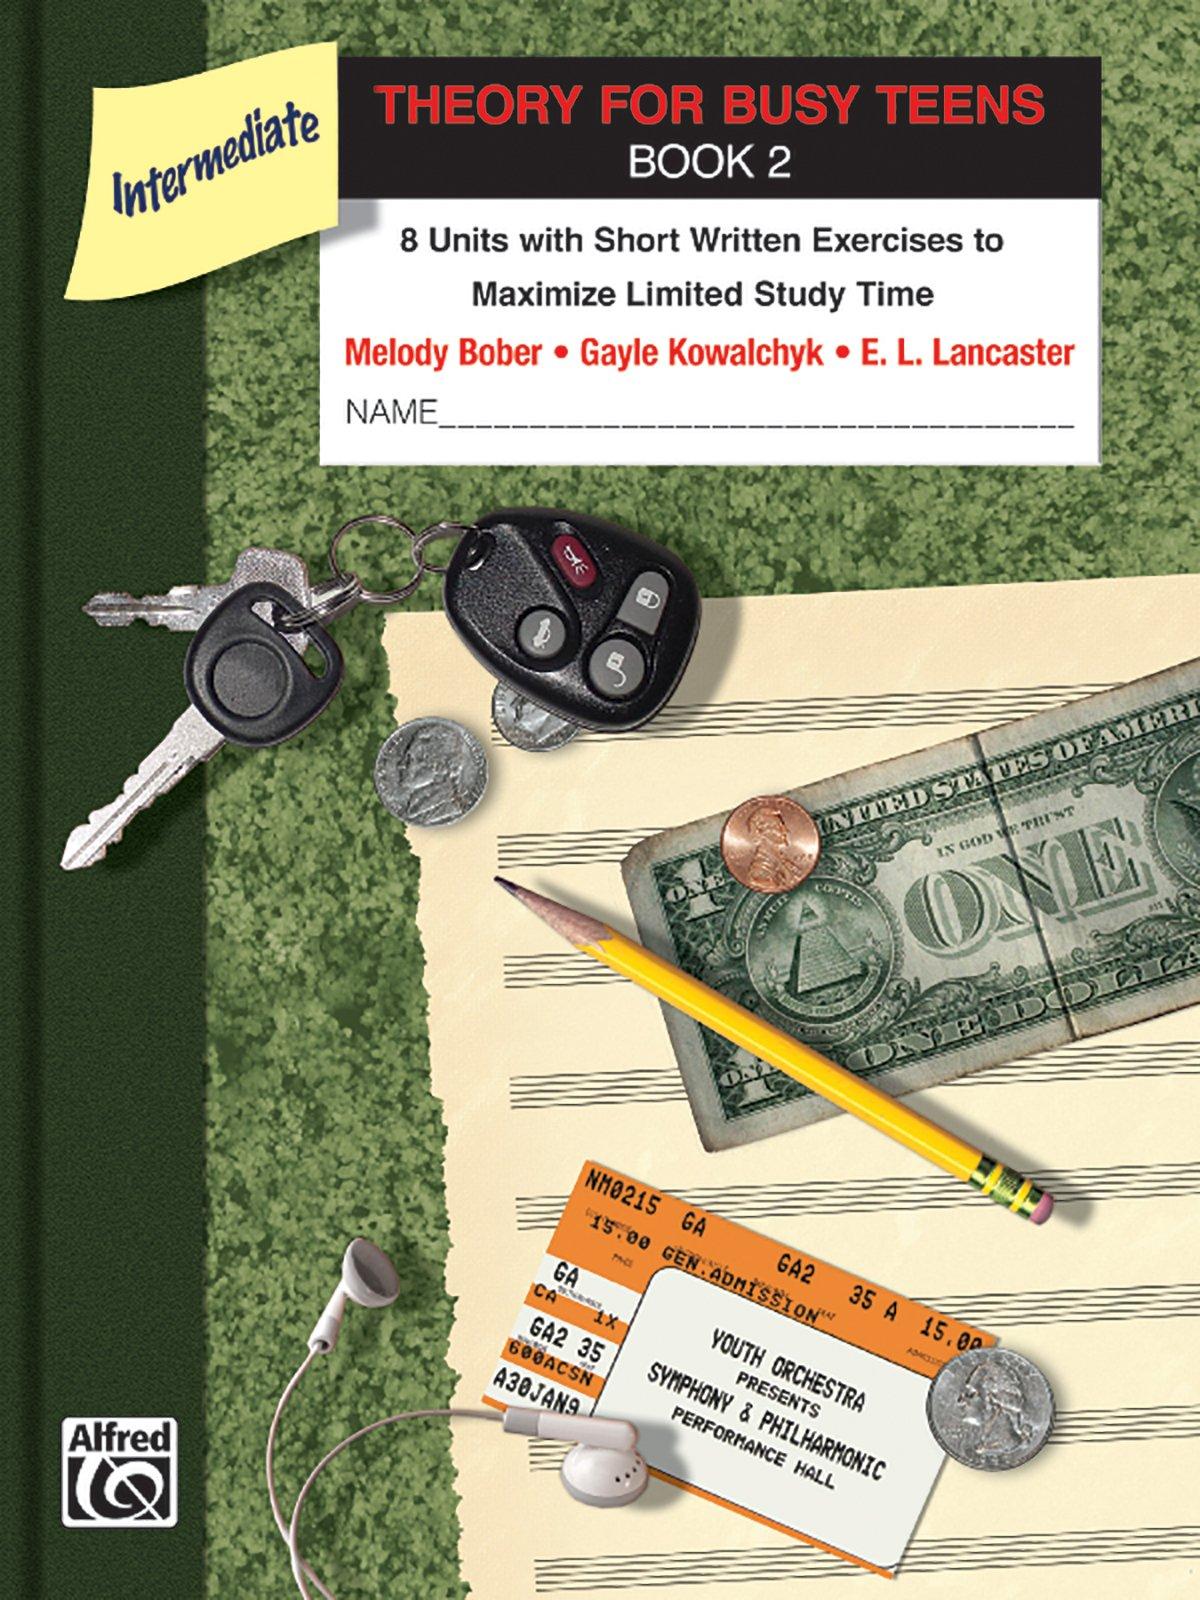 Read Online Disney Book and CD Slipcase: Classic PDF ePub fb2 book